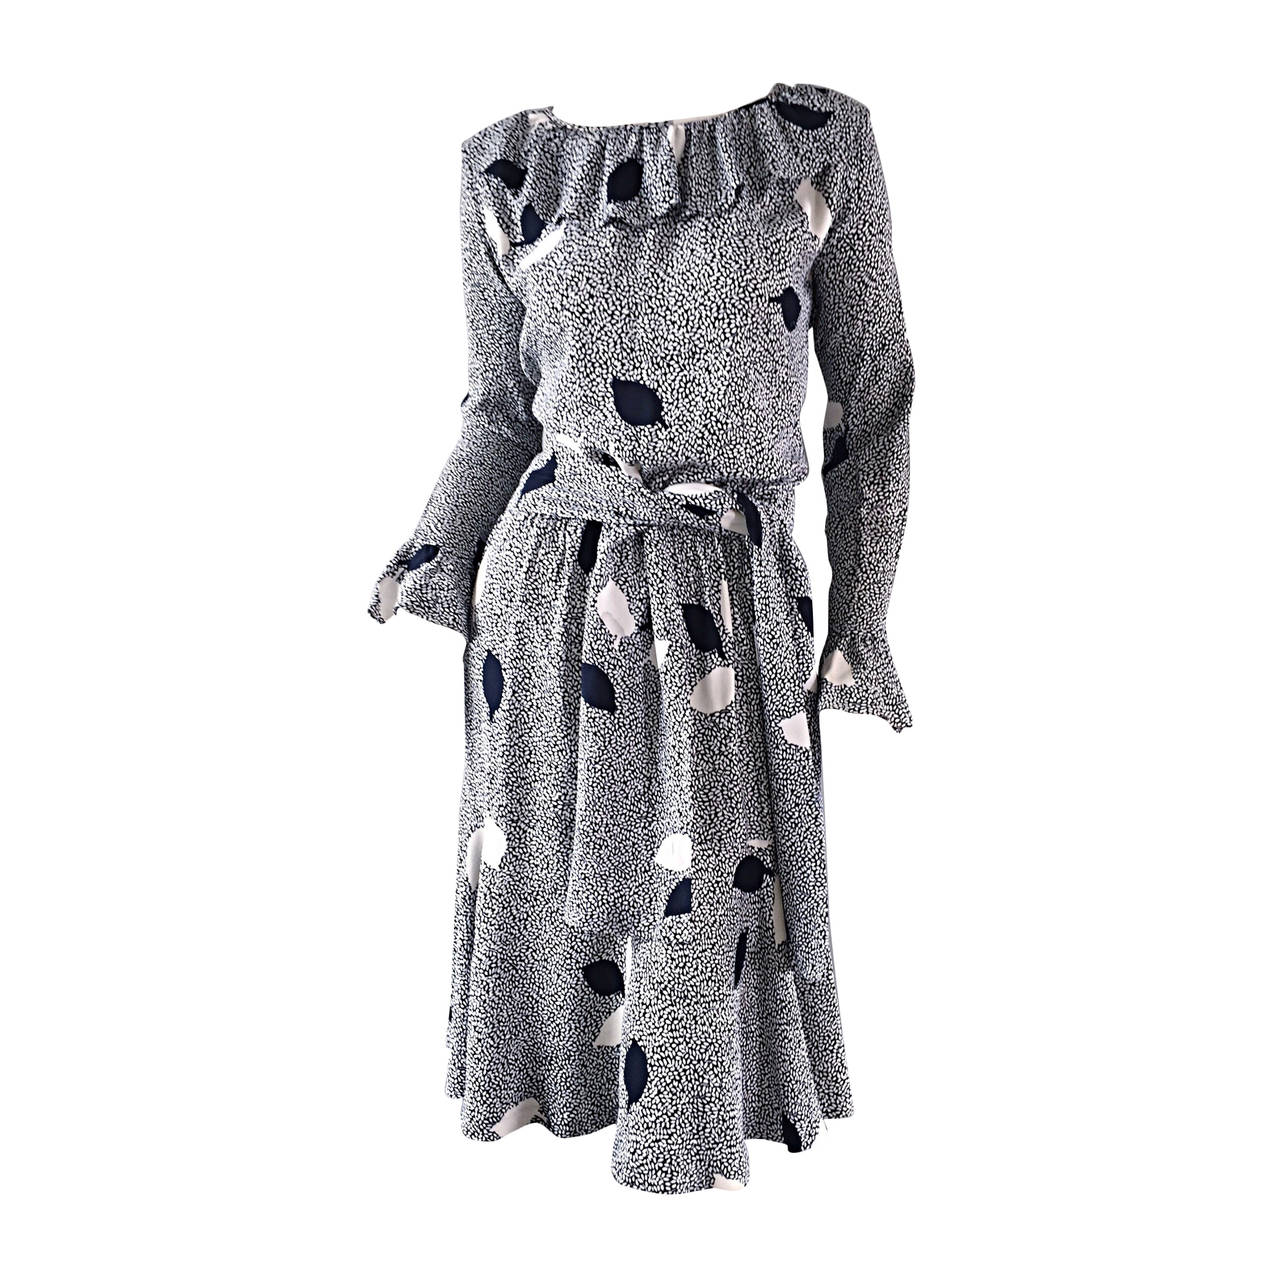 Rare Vintage Yves Saint Laurent Rive Gauche Black White Leaf Dress Sash 1stdibs Com Evening Dresses Vintage Dresses Fashion